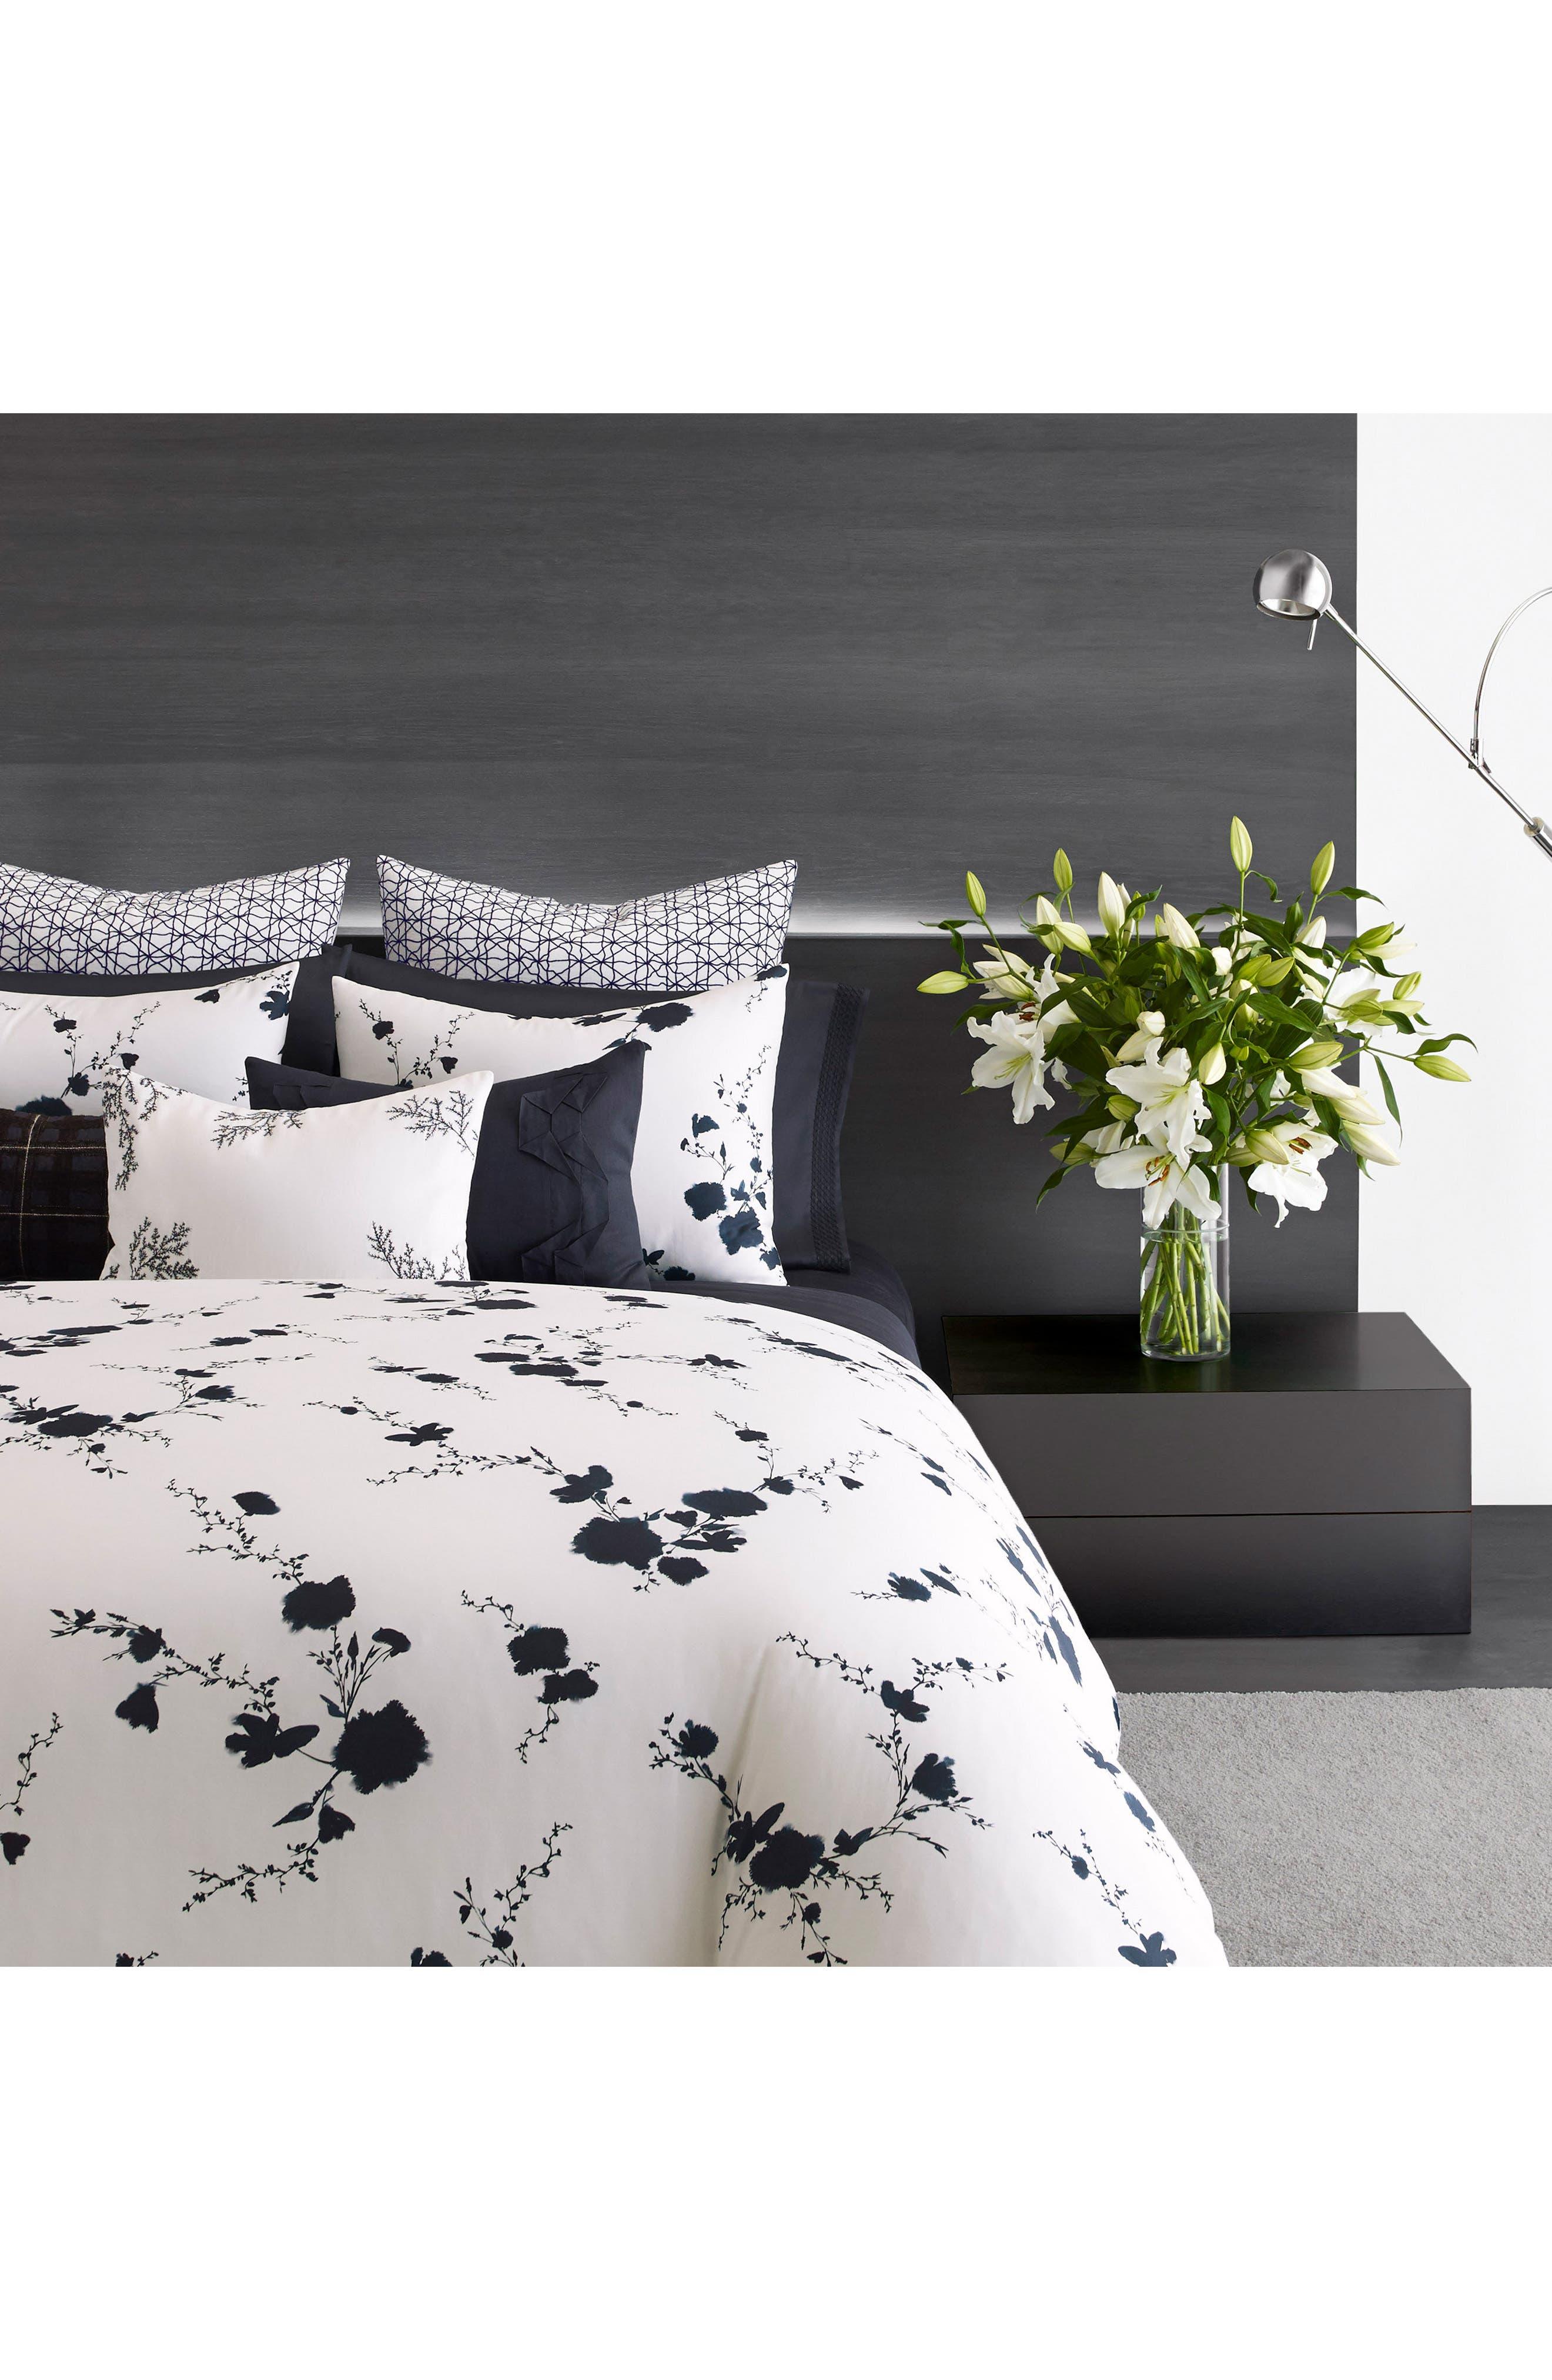 Alternate Image 1 Selected - Vera Wang Ink Wash Floral Duvet Cover